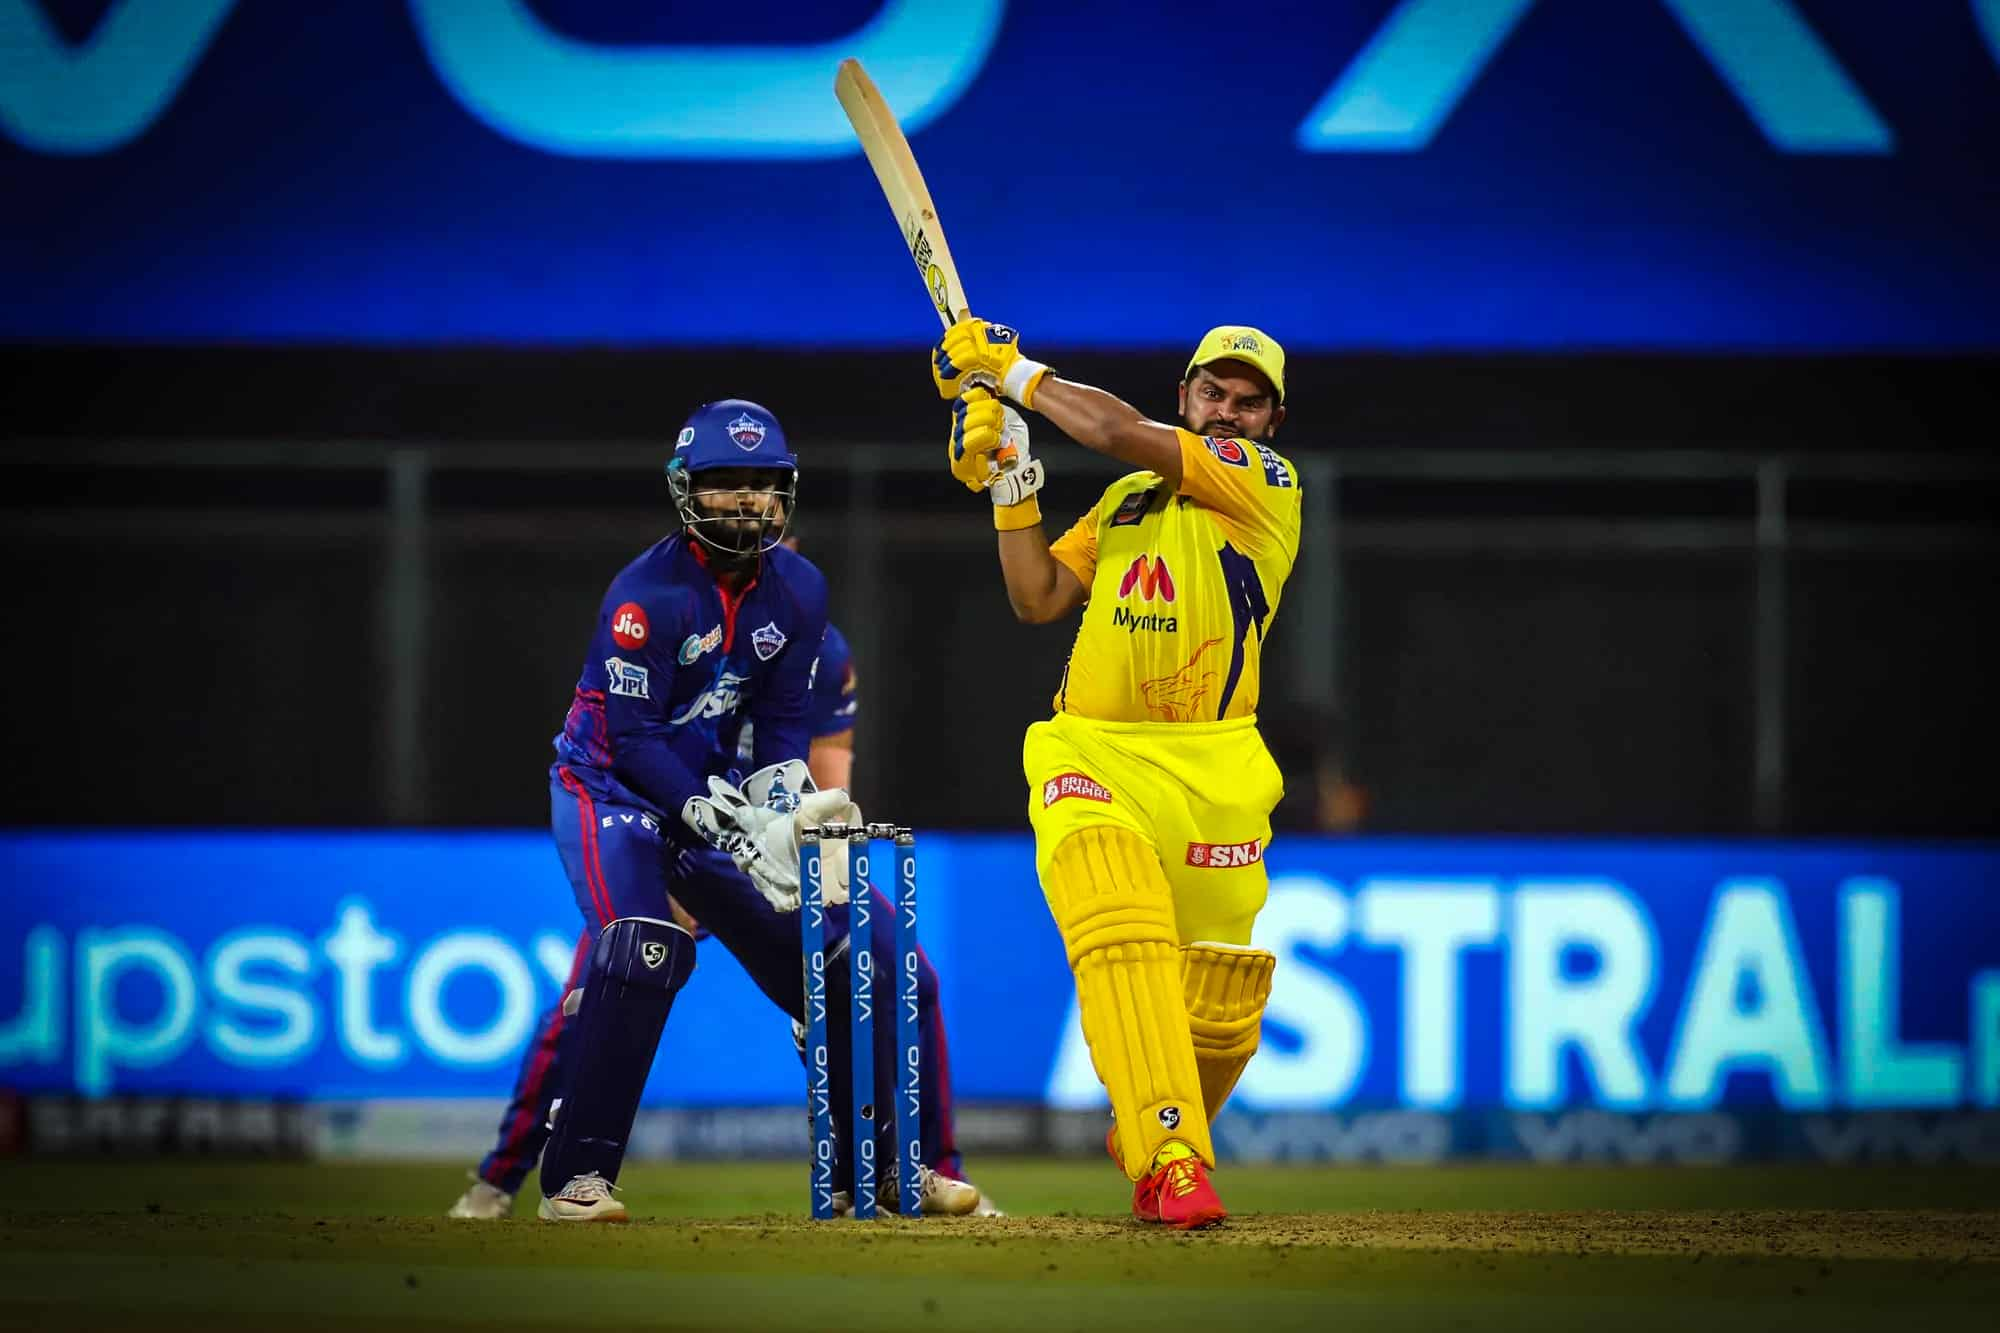 IPL 2021, CSK vs DC - Match 2: Suresh Raina Slams 39th IPL Fifty